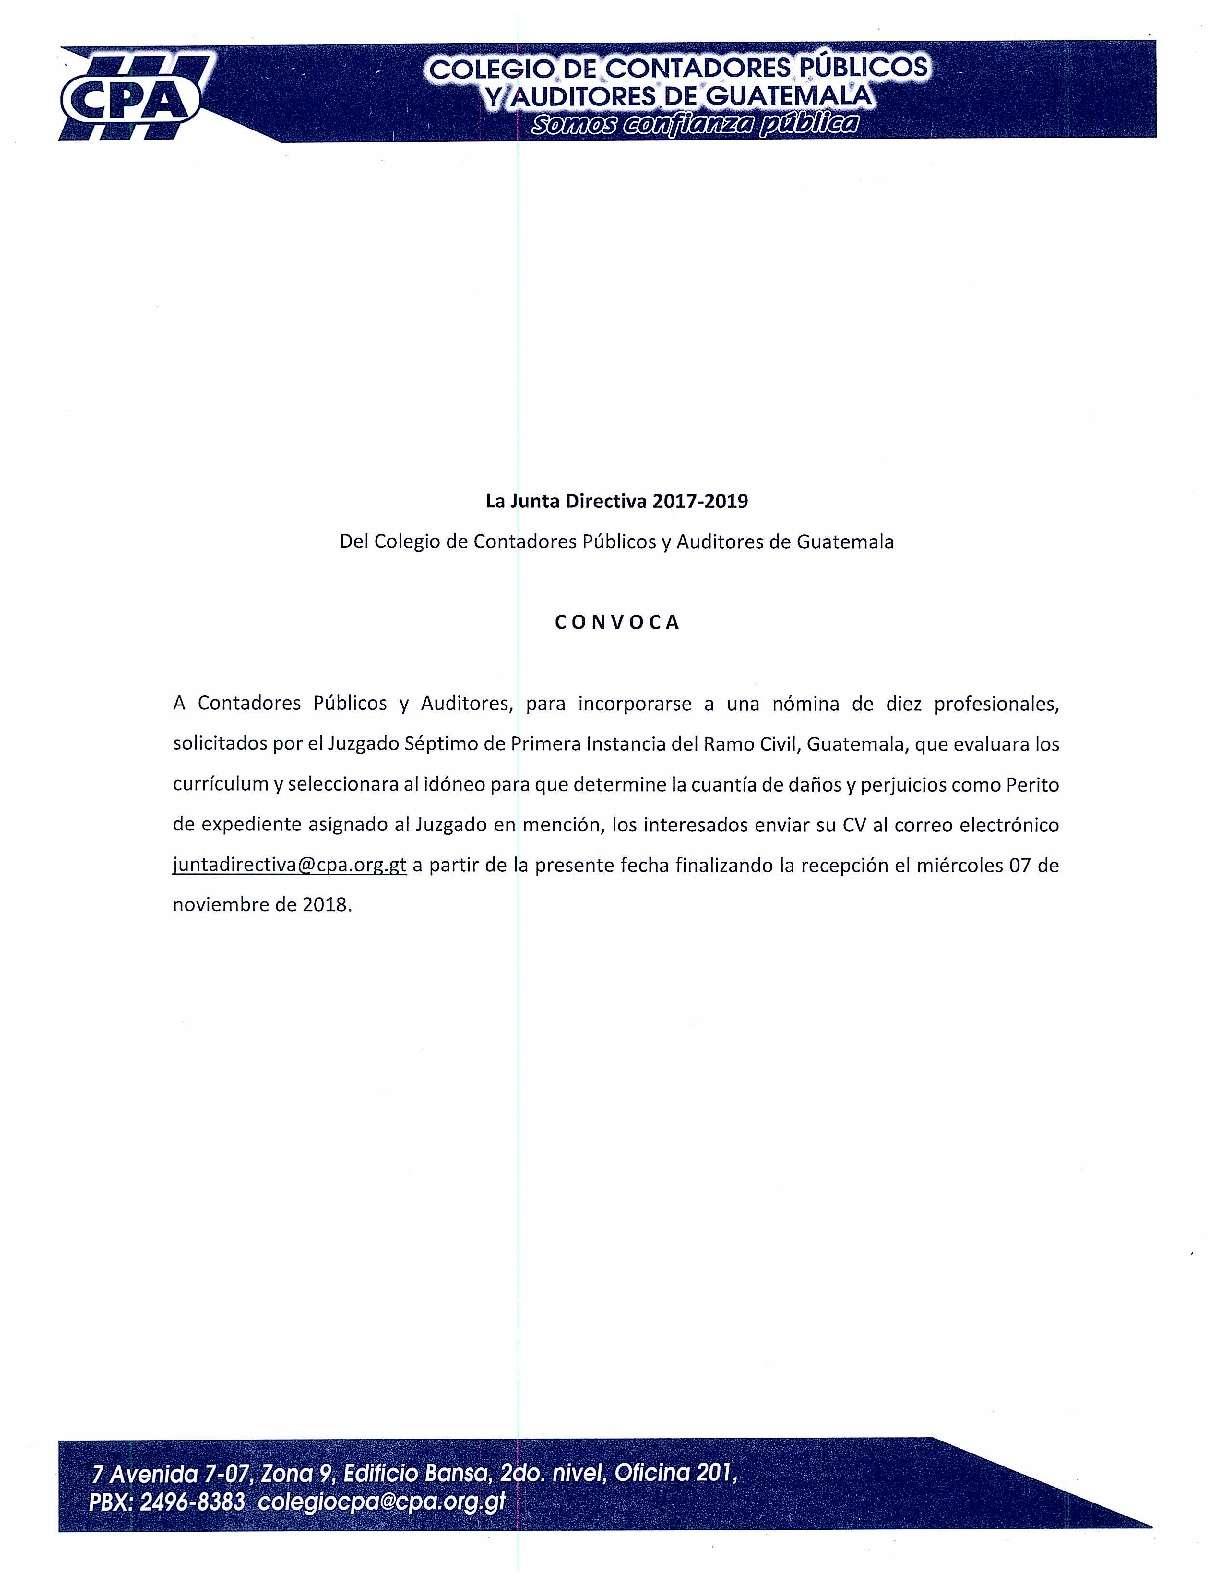 Convocatoria Perito de expediente – Juzgado Séptimo de Primera Instancia del Ramo Civil, Guatemala